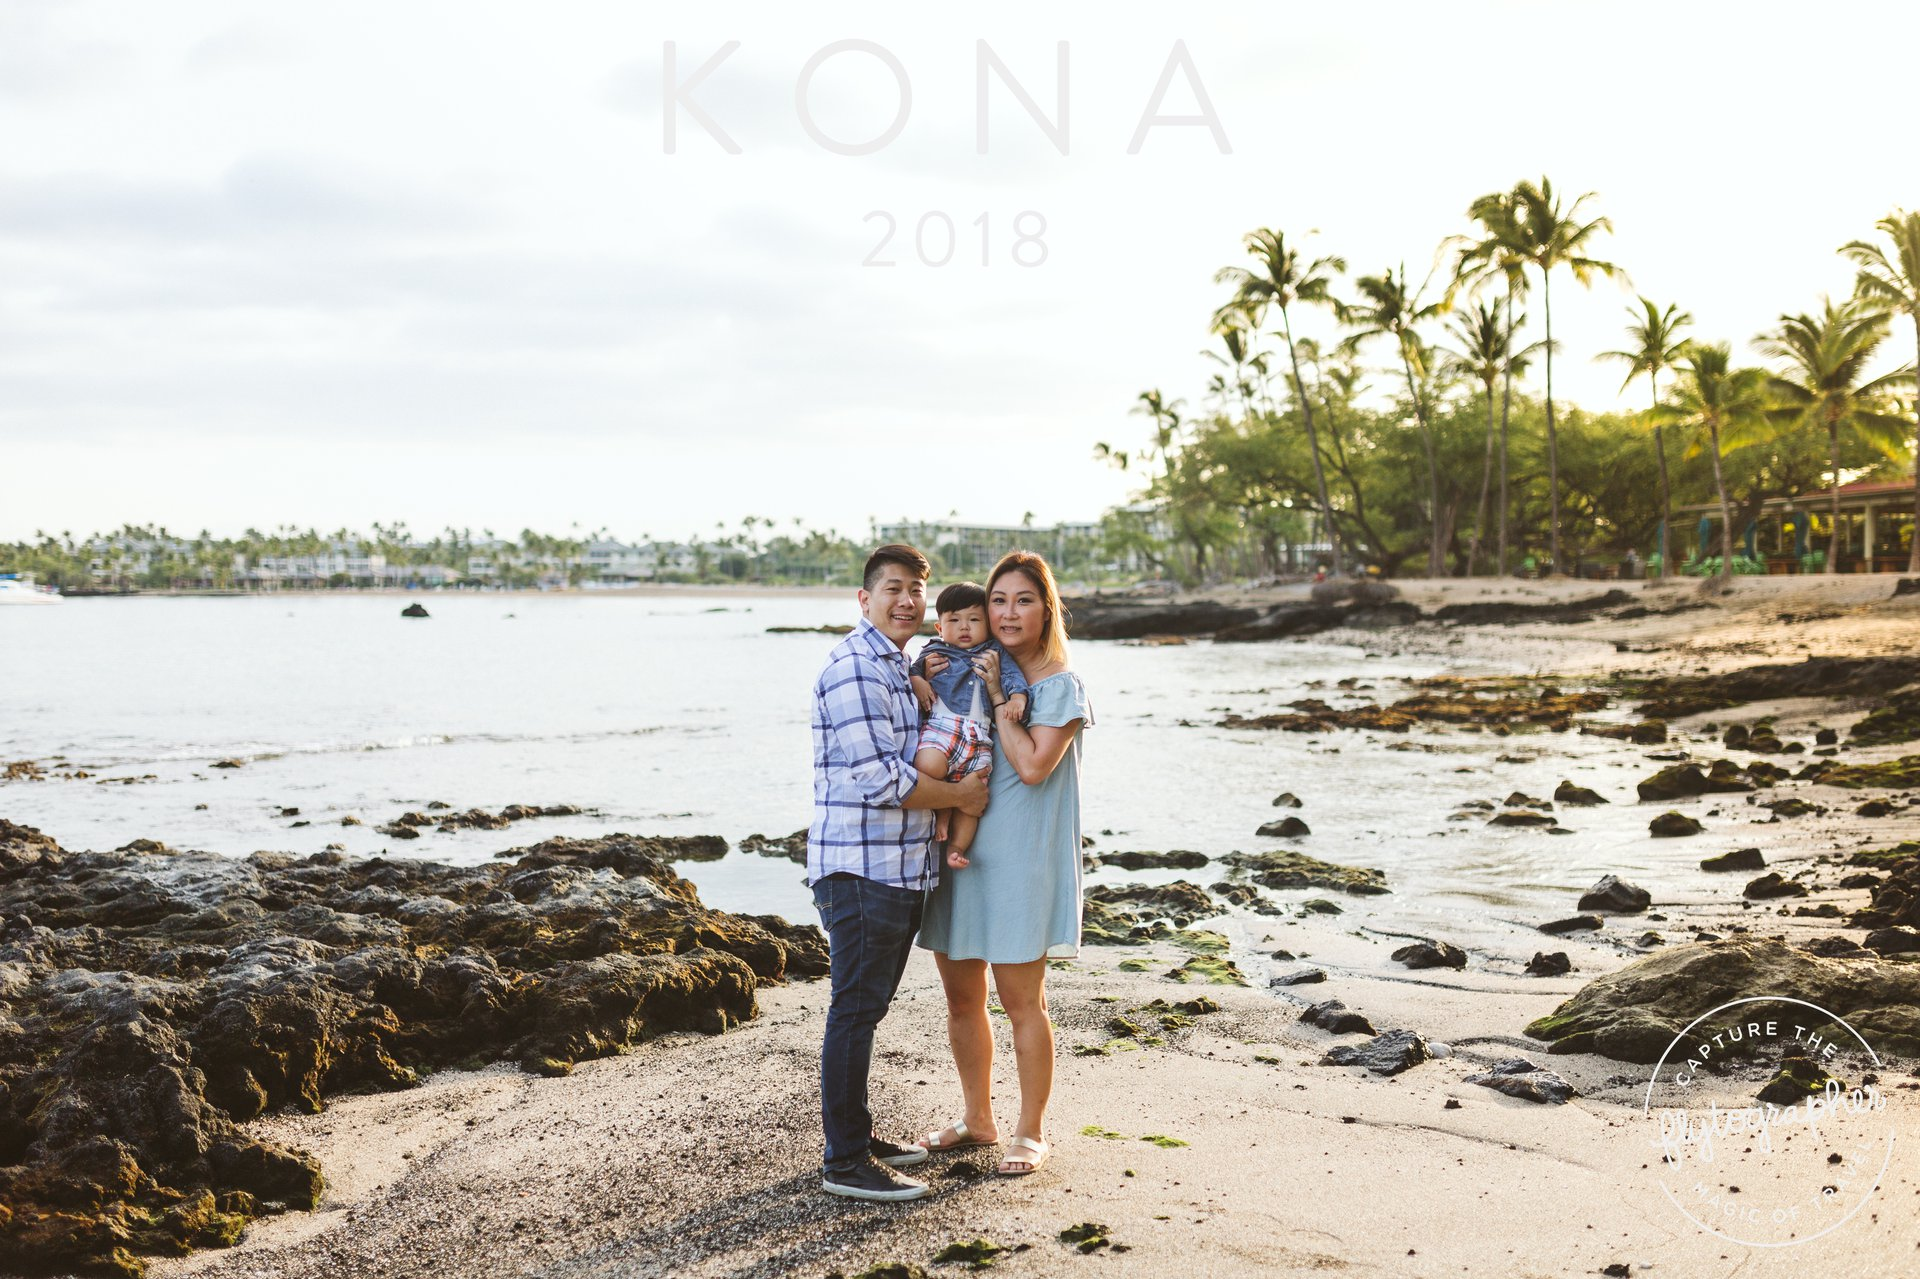 Flytographer Travel Story - My Kona Vacation